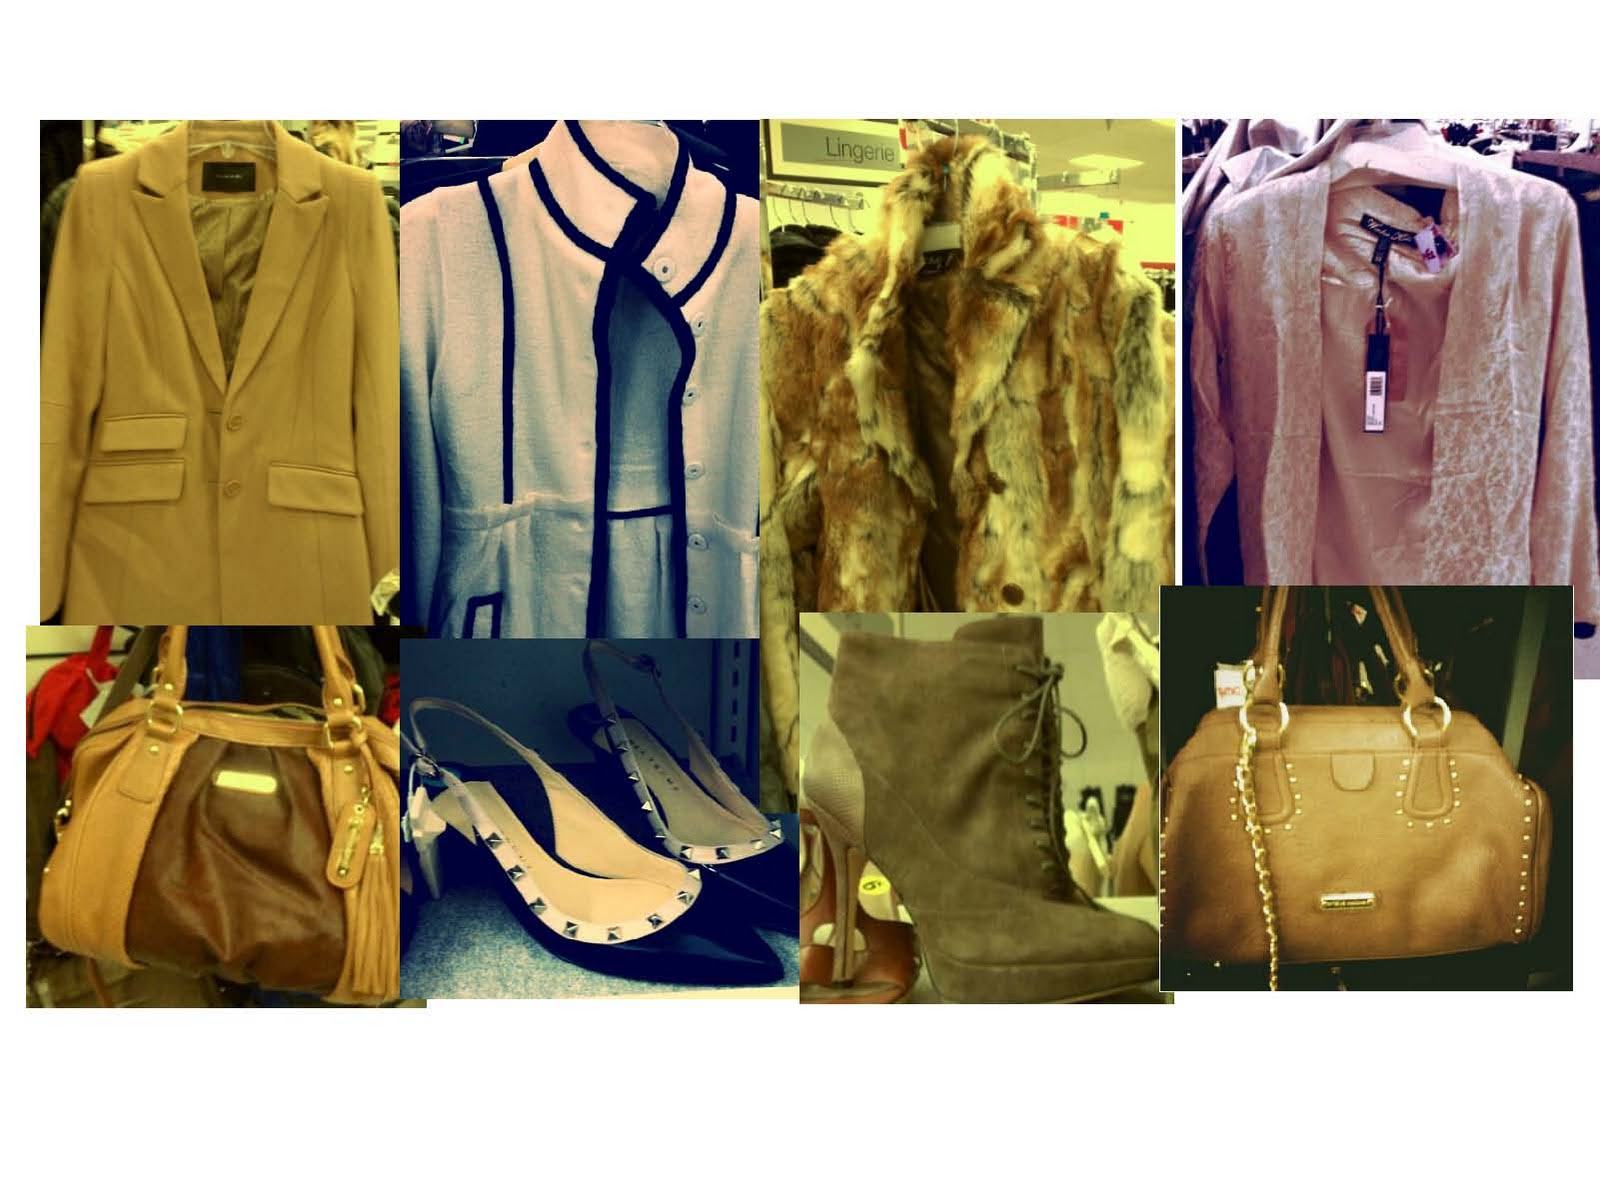 Xx: Shop Handbags, Shoes, Jewelry, Home Decor